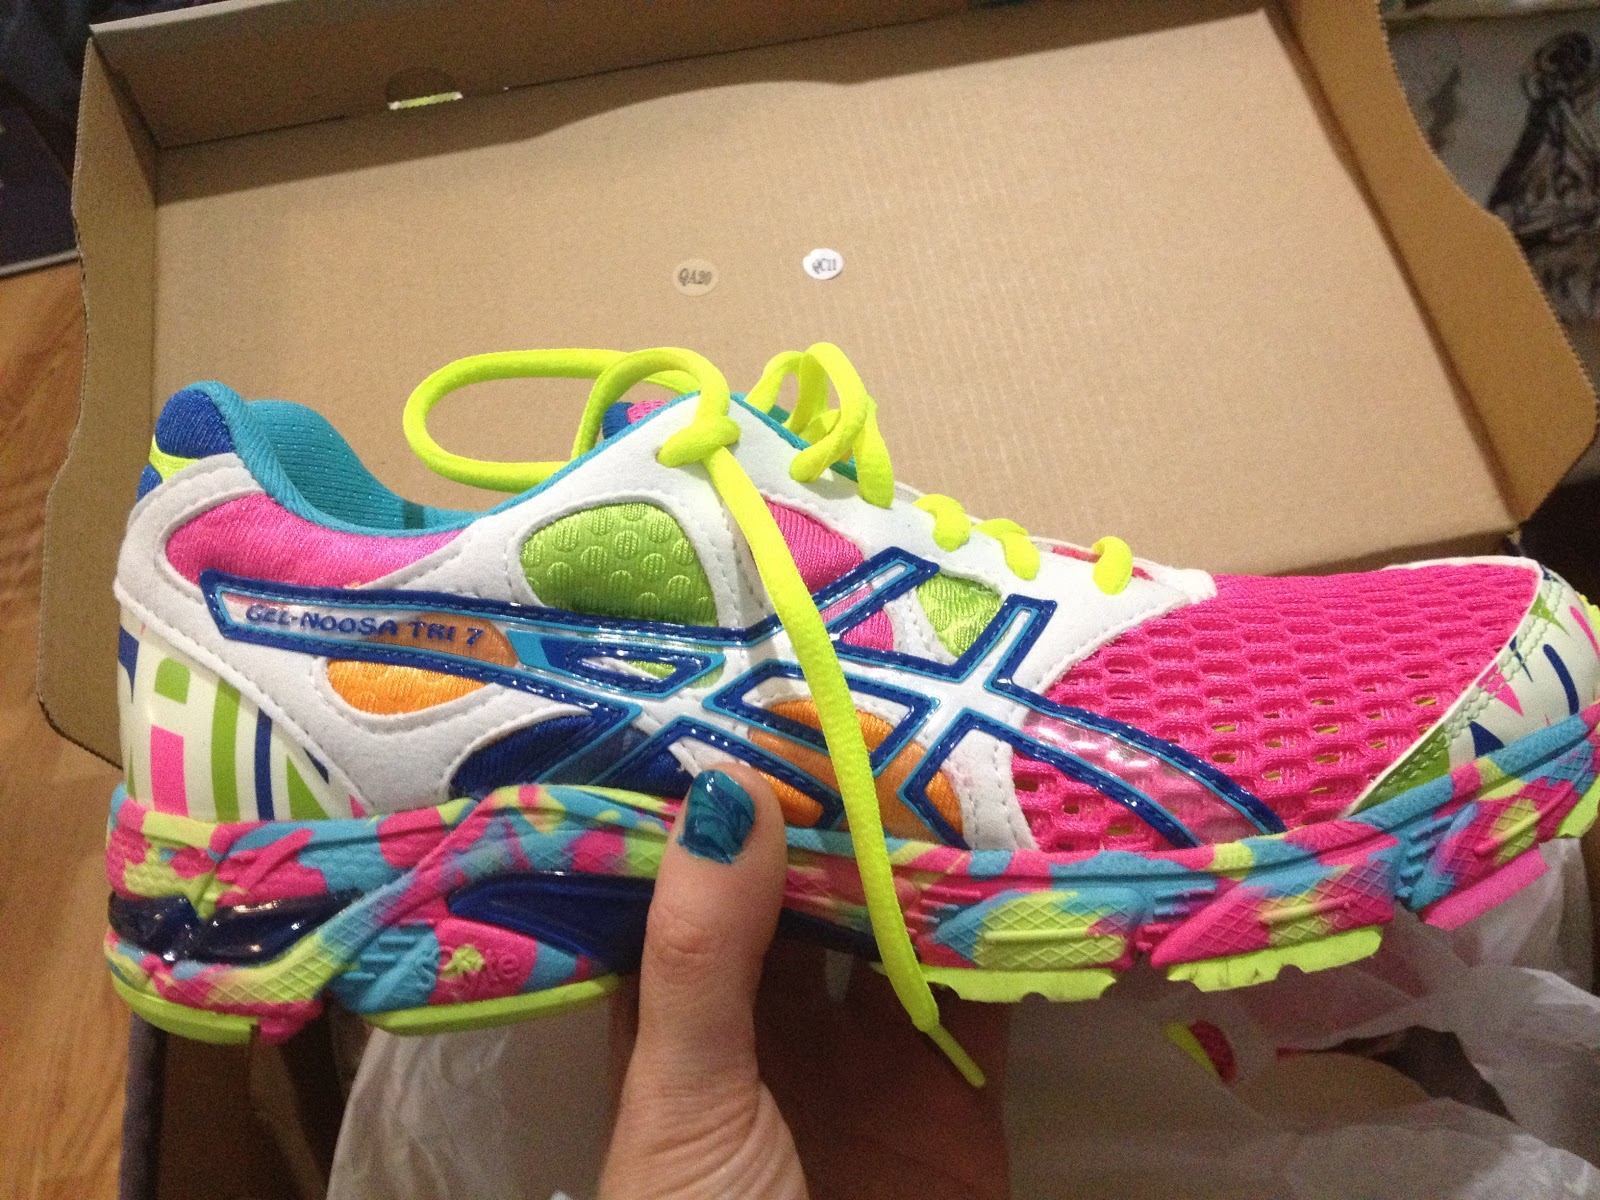 Asics Gel Noosa Tri  Road Running Shoes Women